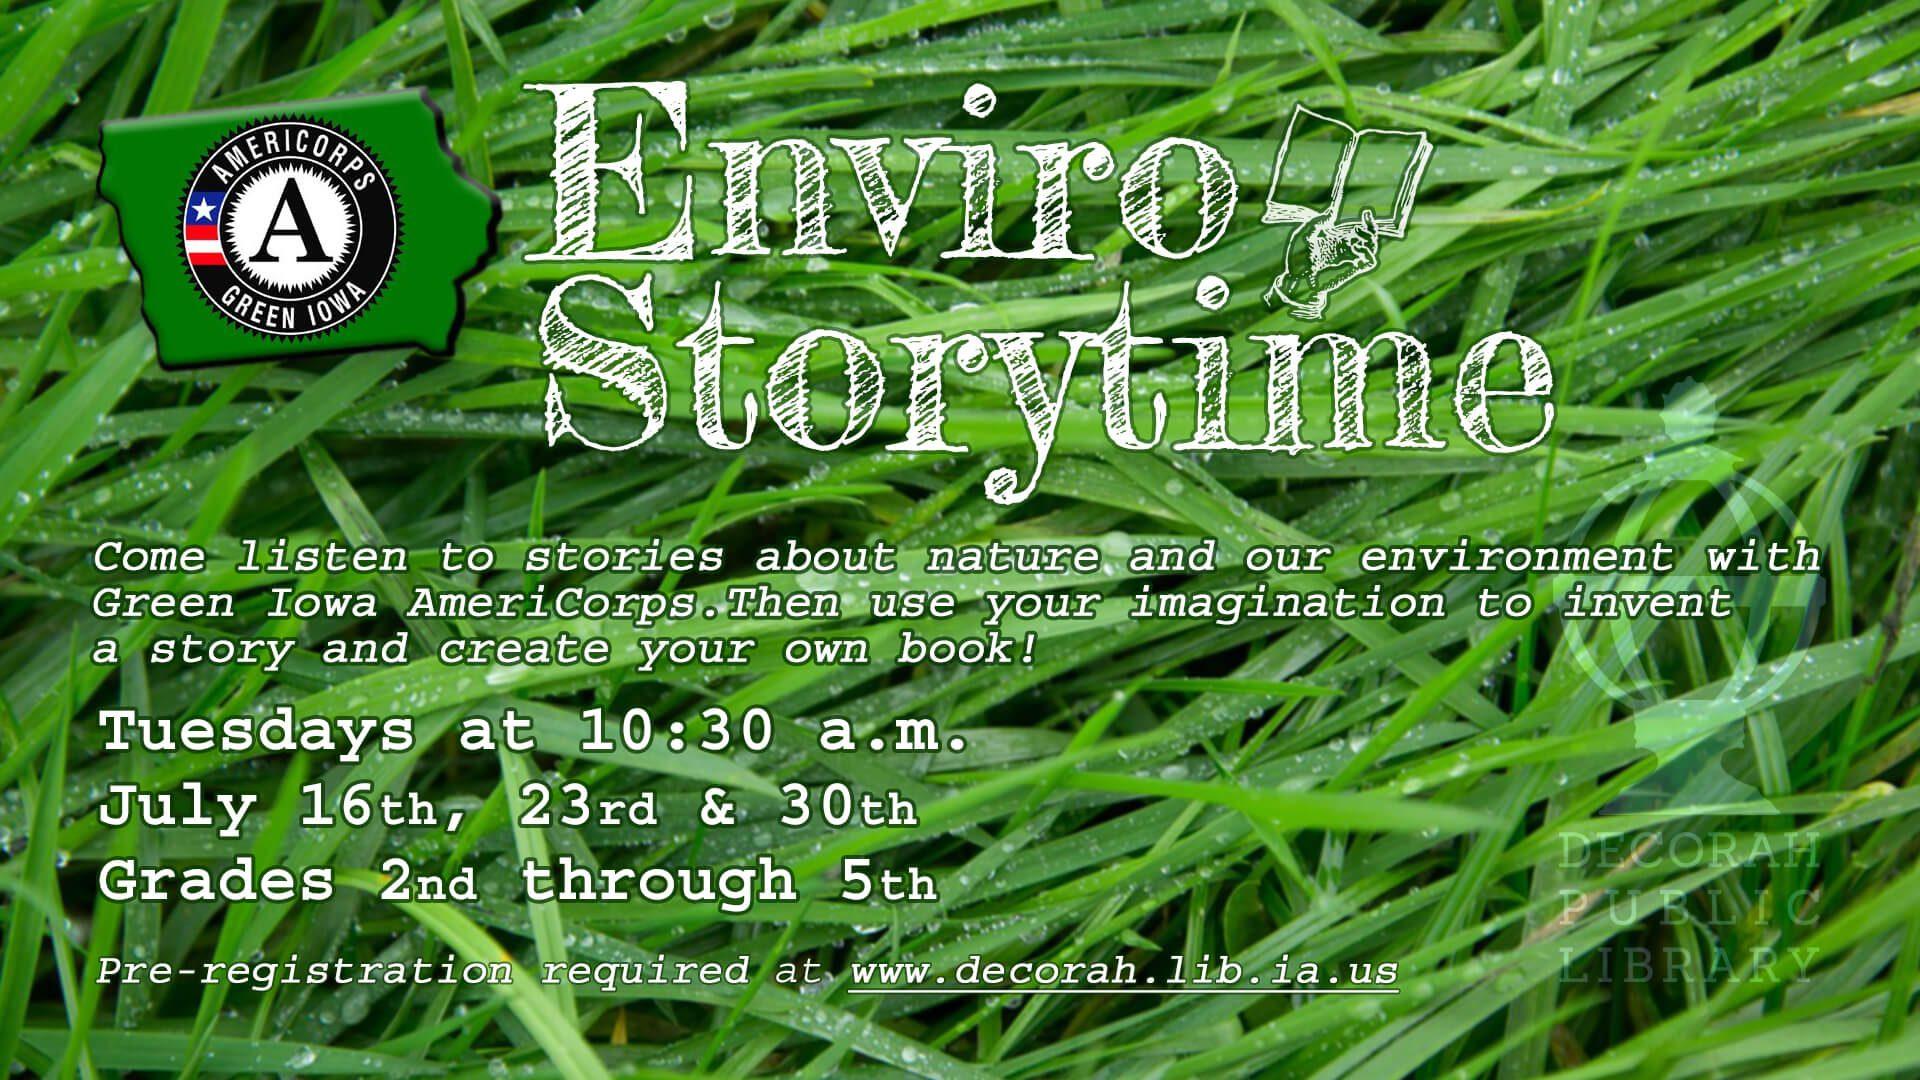 Enviro Storytime July 16 23 30